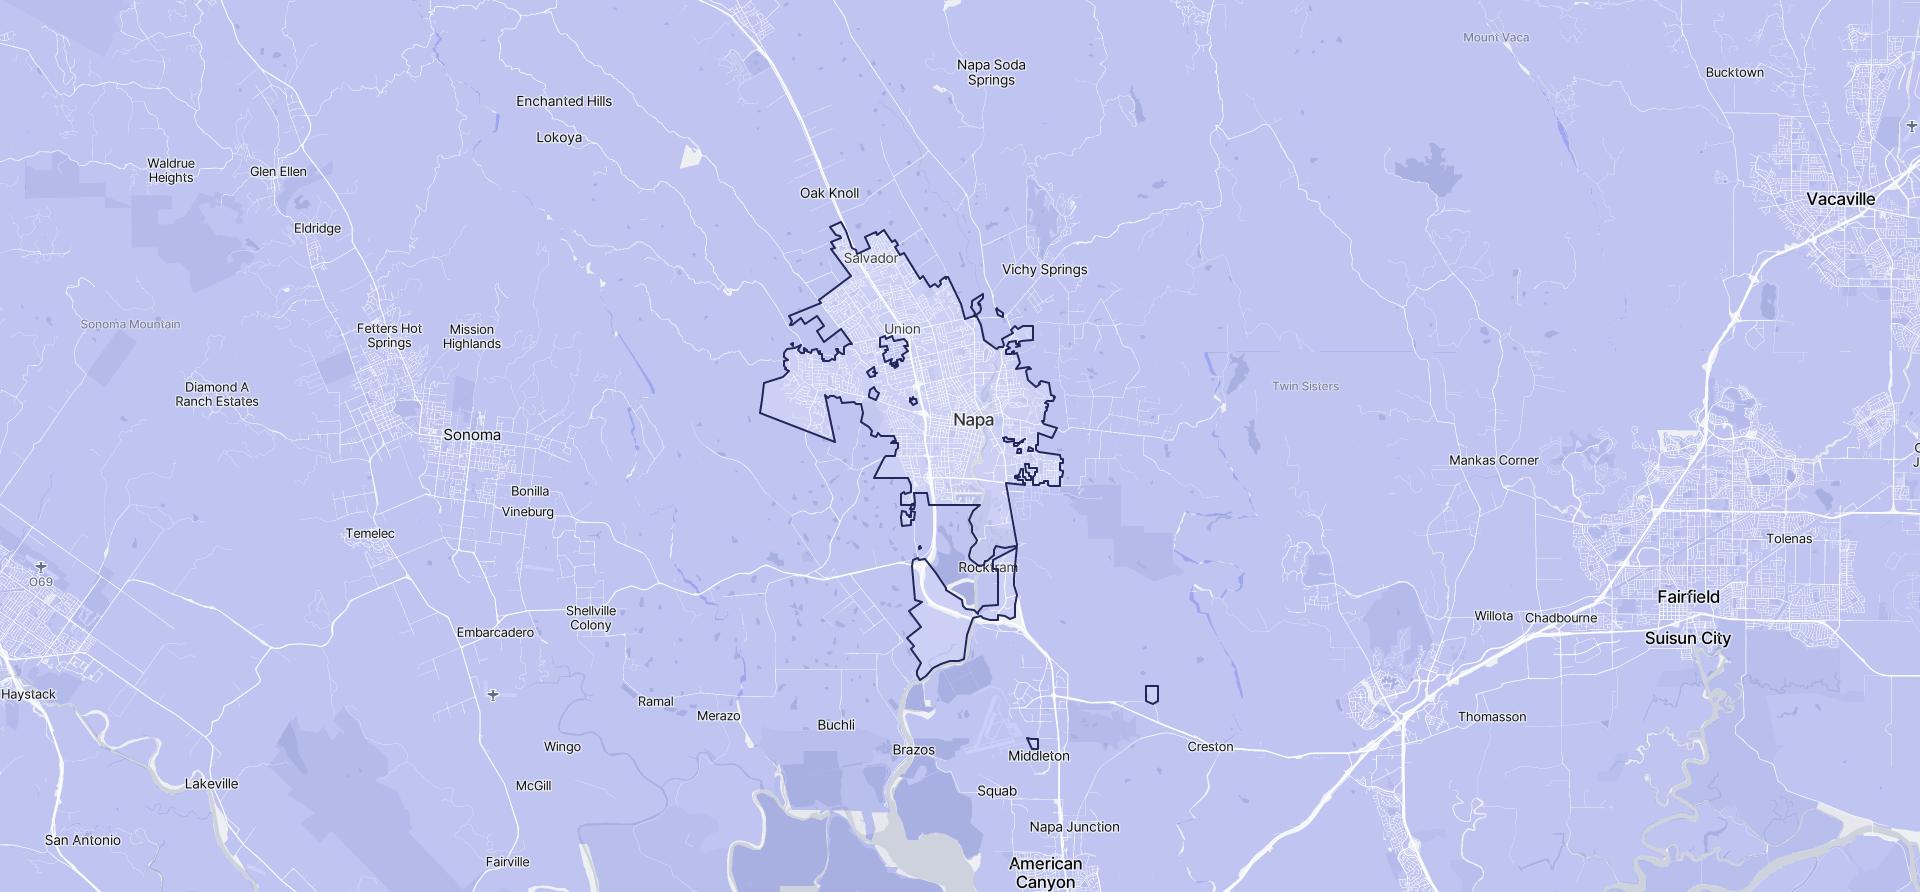 Image of Napa boundaries on a map.